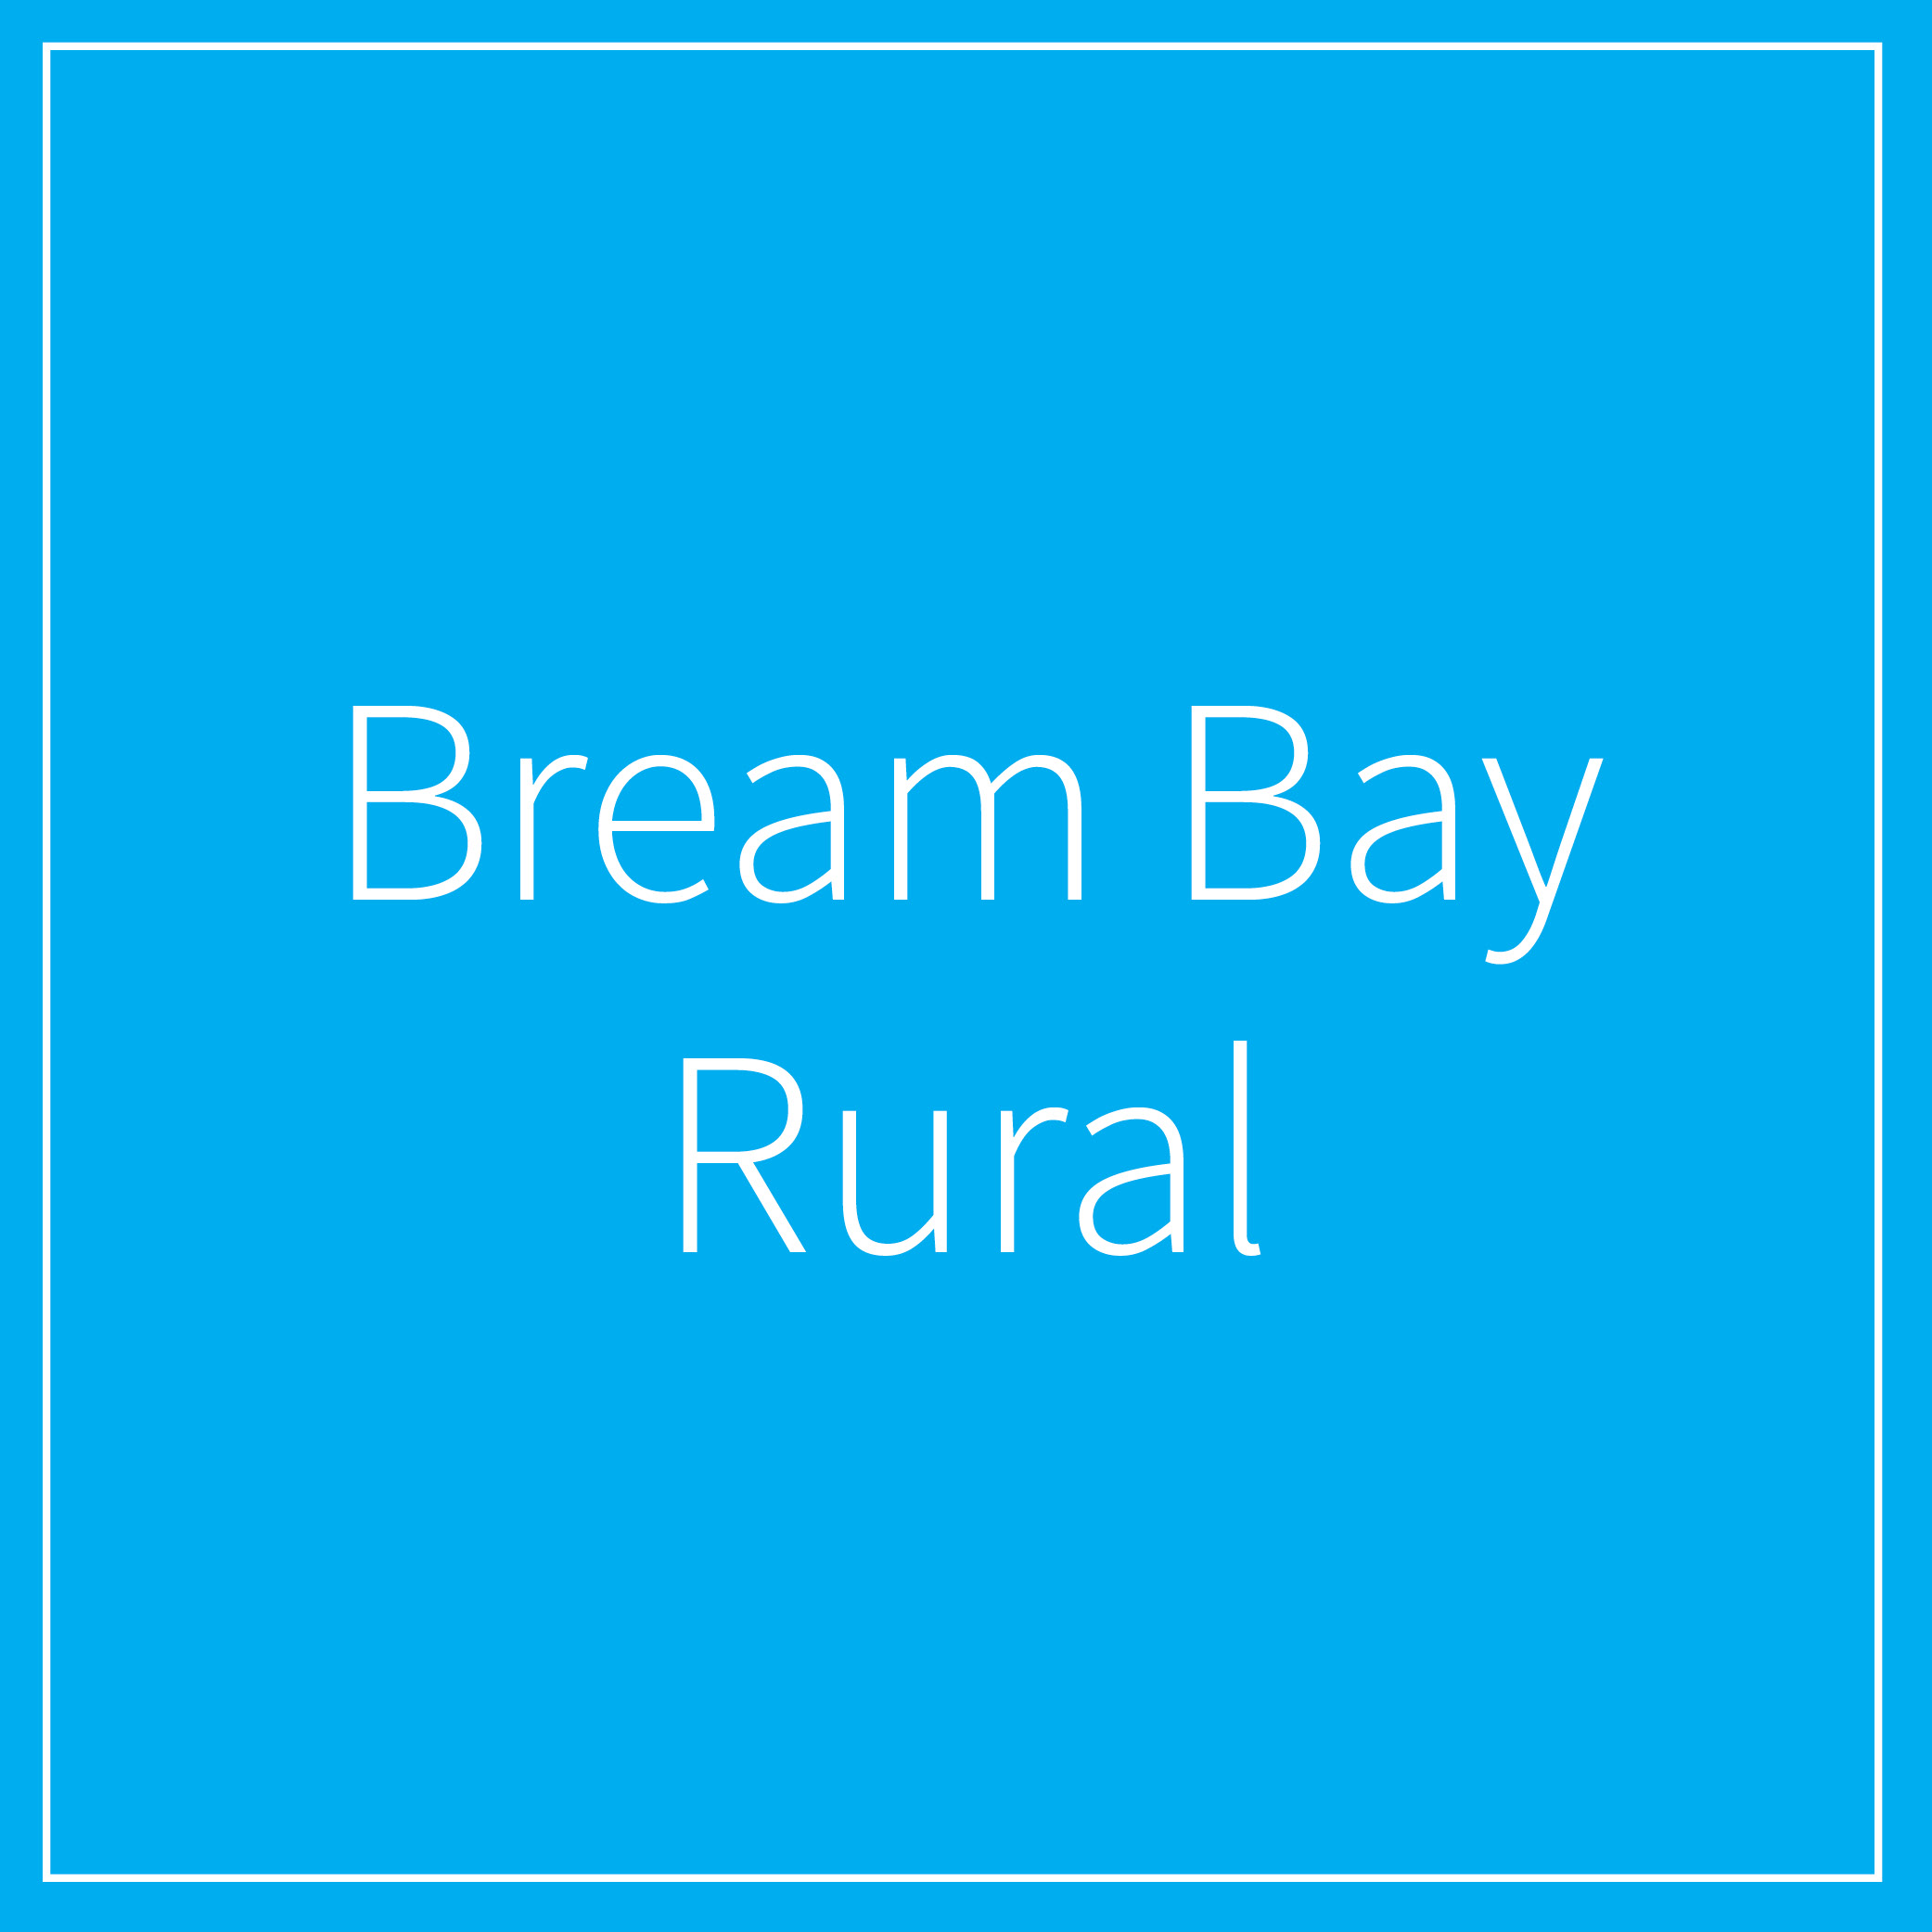 BB Rural.jpg